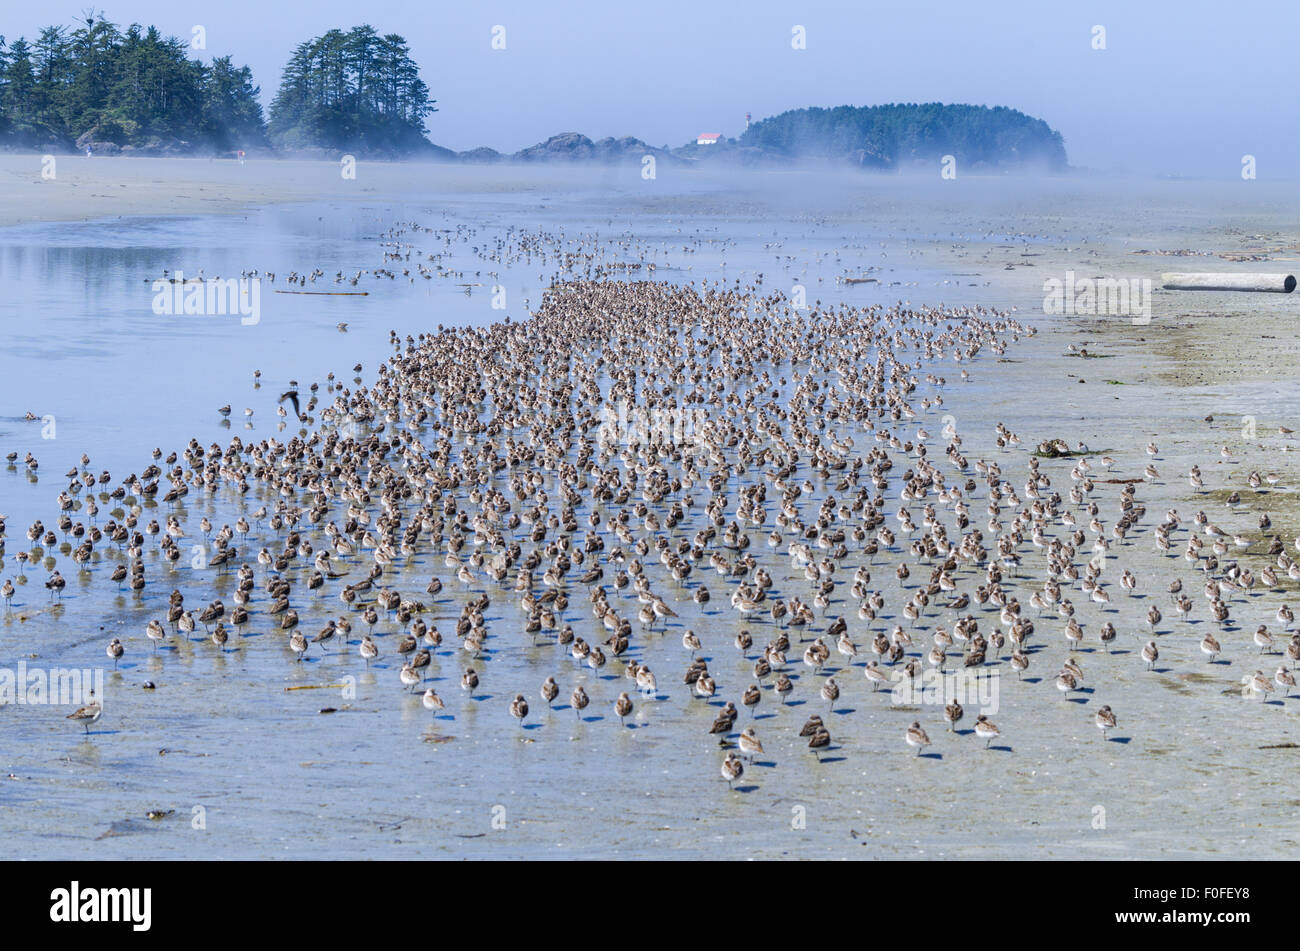 Flock of sandpipers on Chesterman Beach Tofino, Vancouver Island British Columbia Canada - Stock Image